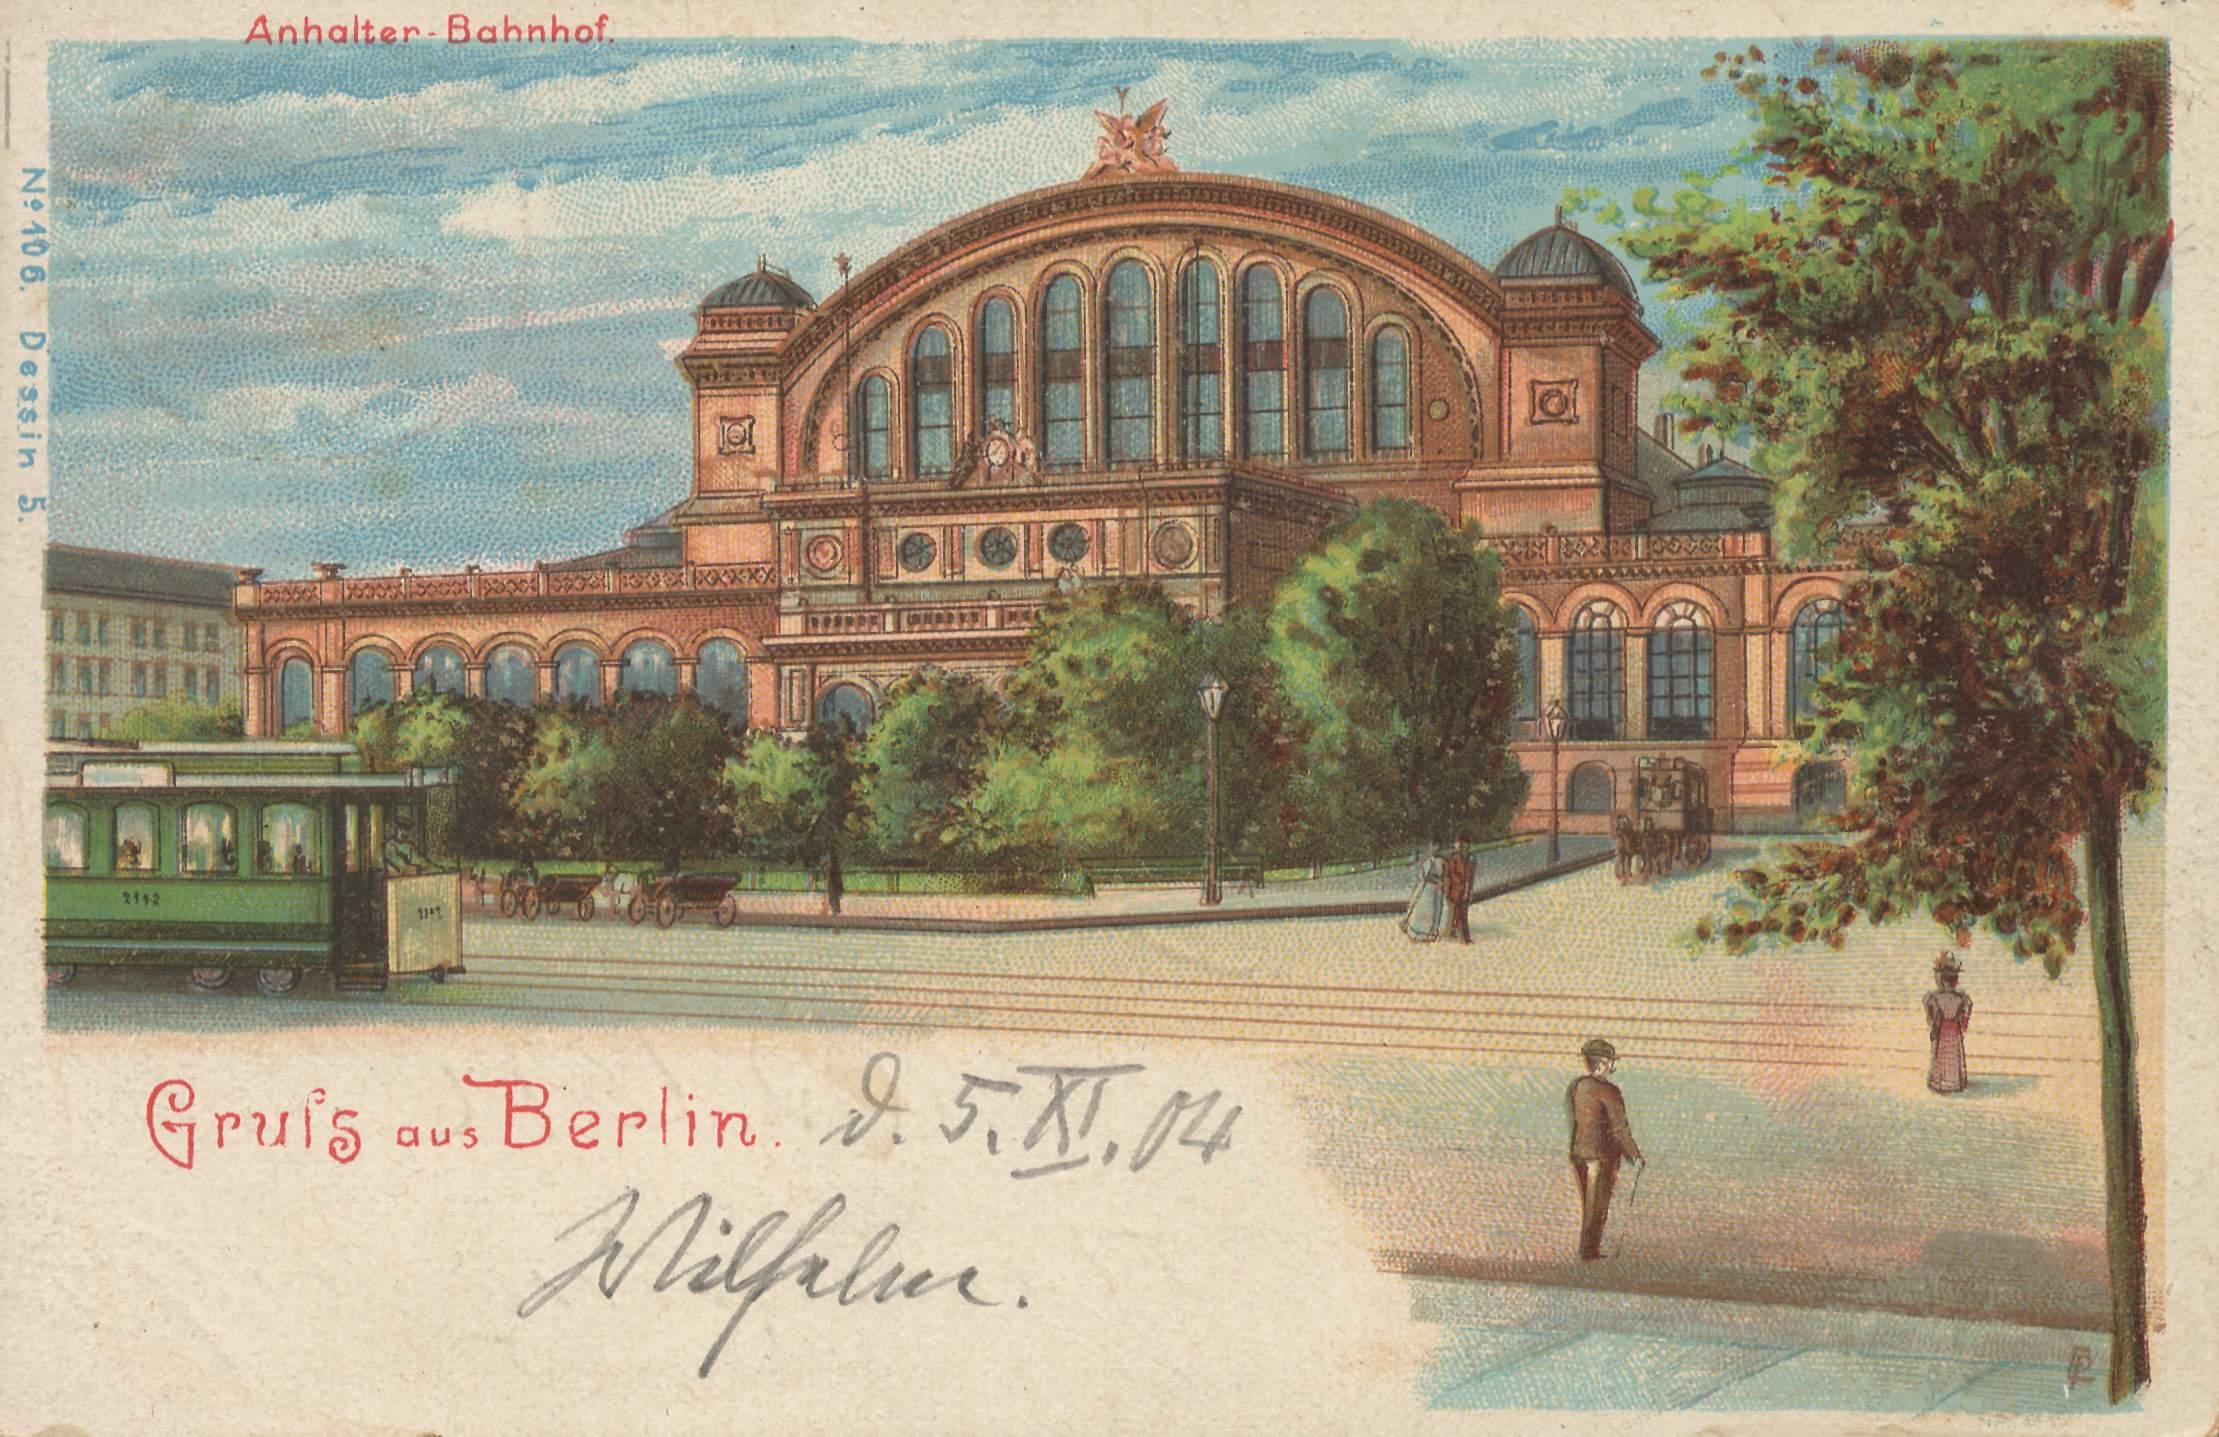 Berlin-Kreuzberg_Postkarte_009.jpg